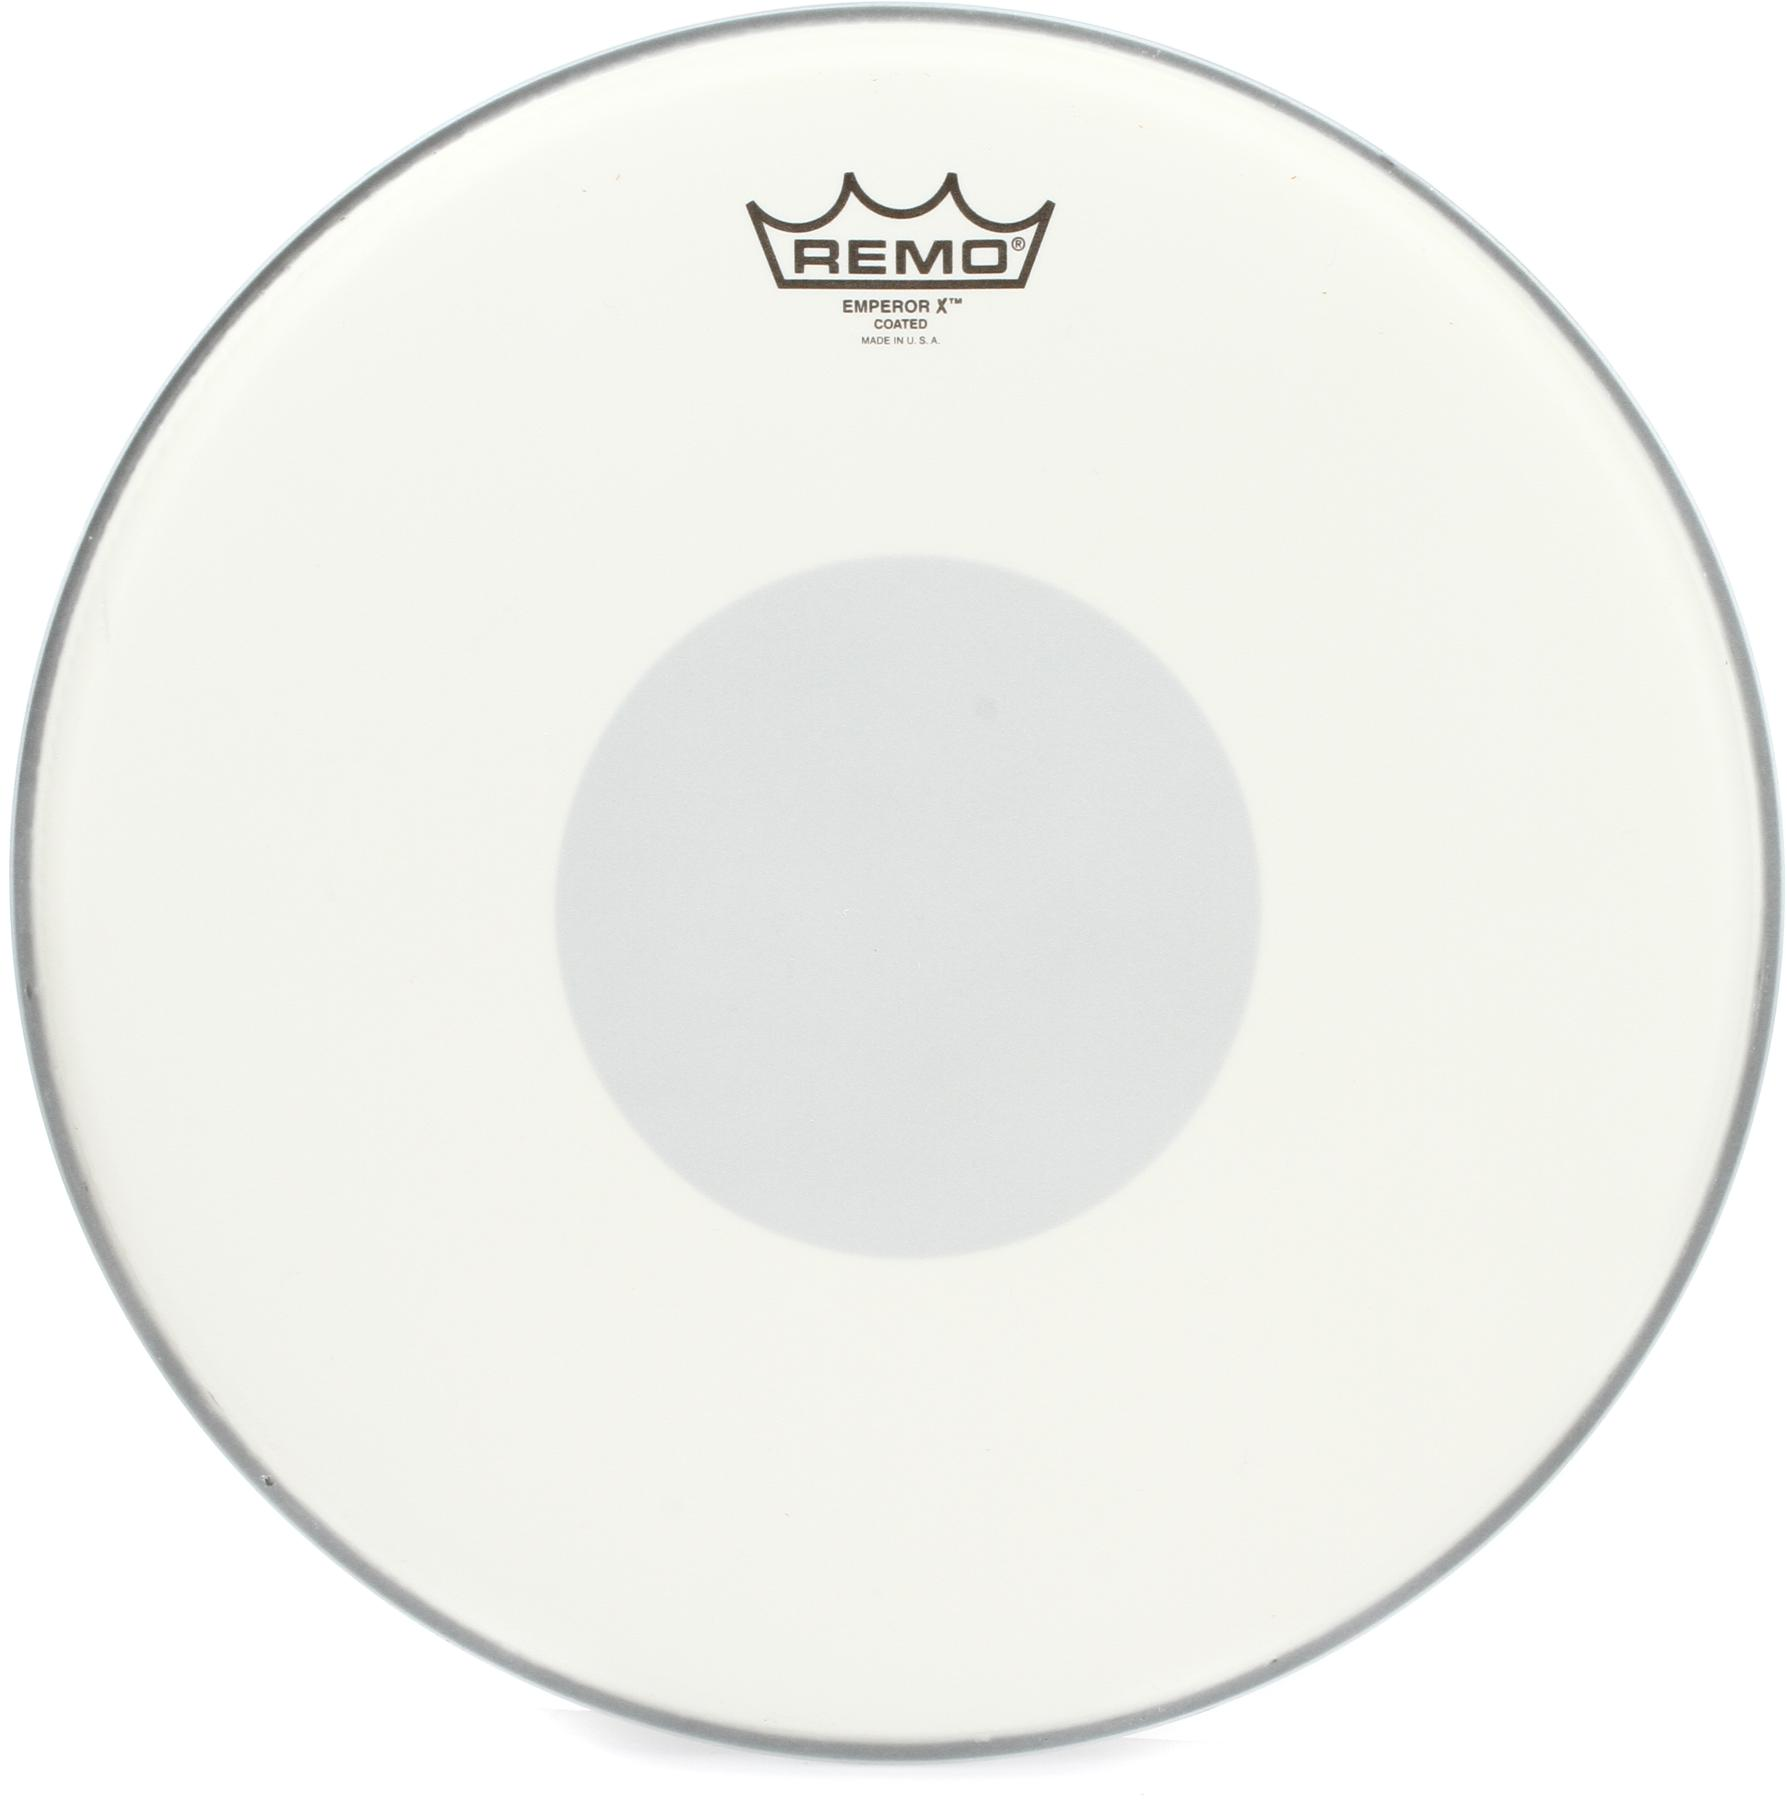 1. Remo Emperor X Coated Snare Drum Head